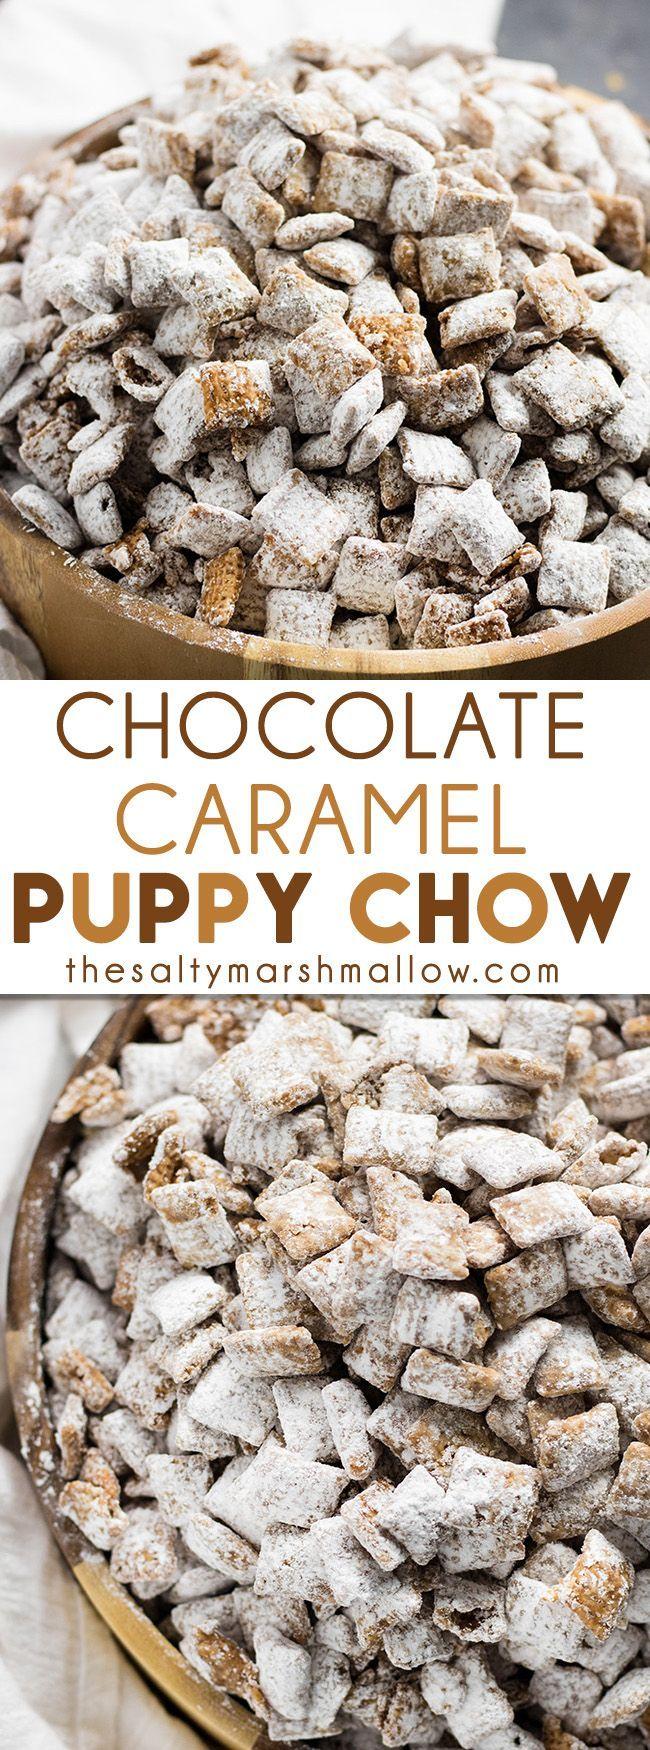 Chocolate Caramel Puppy Chow Recipe Snack mix recipes